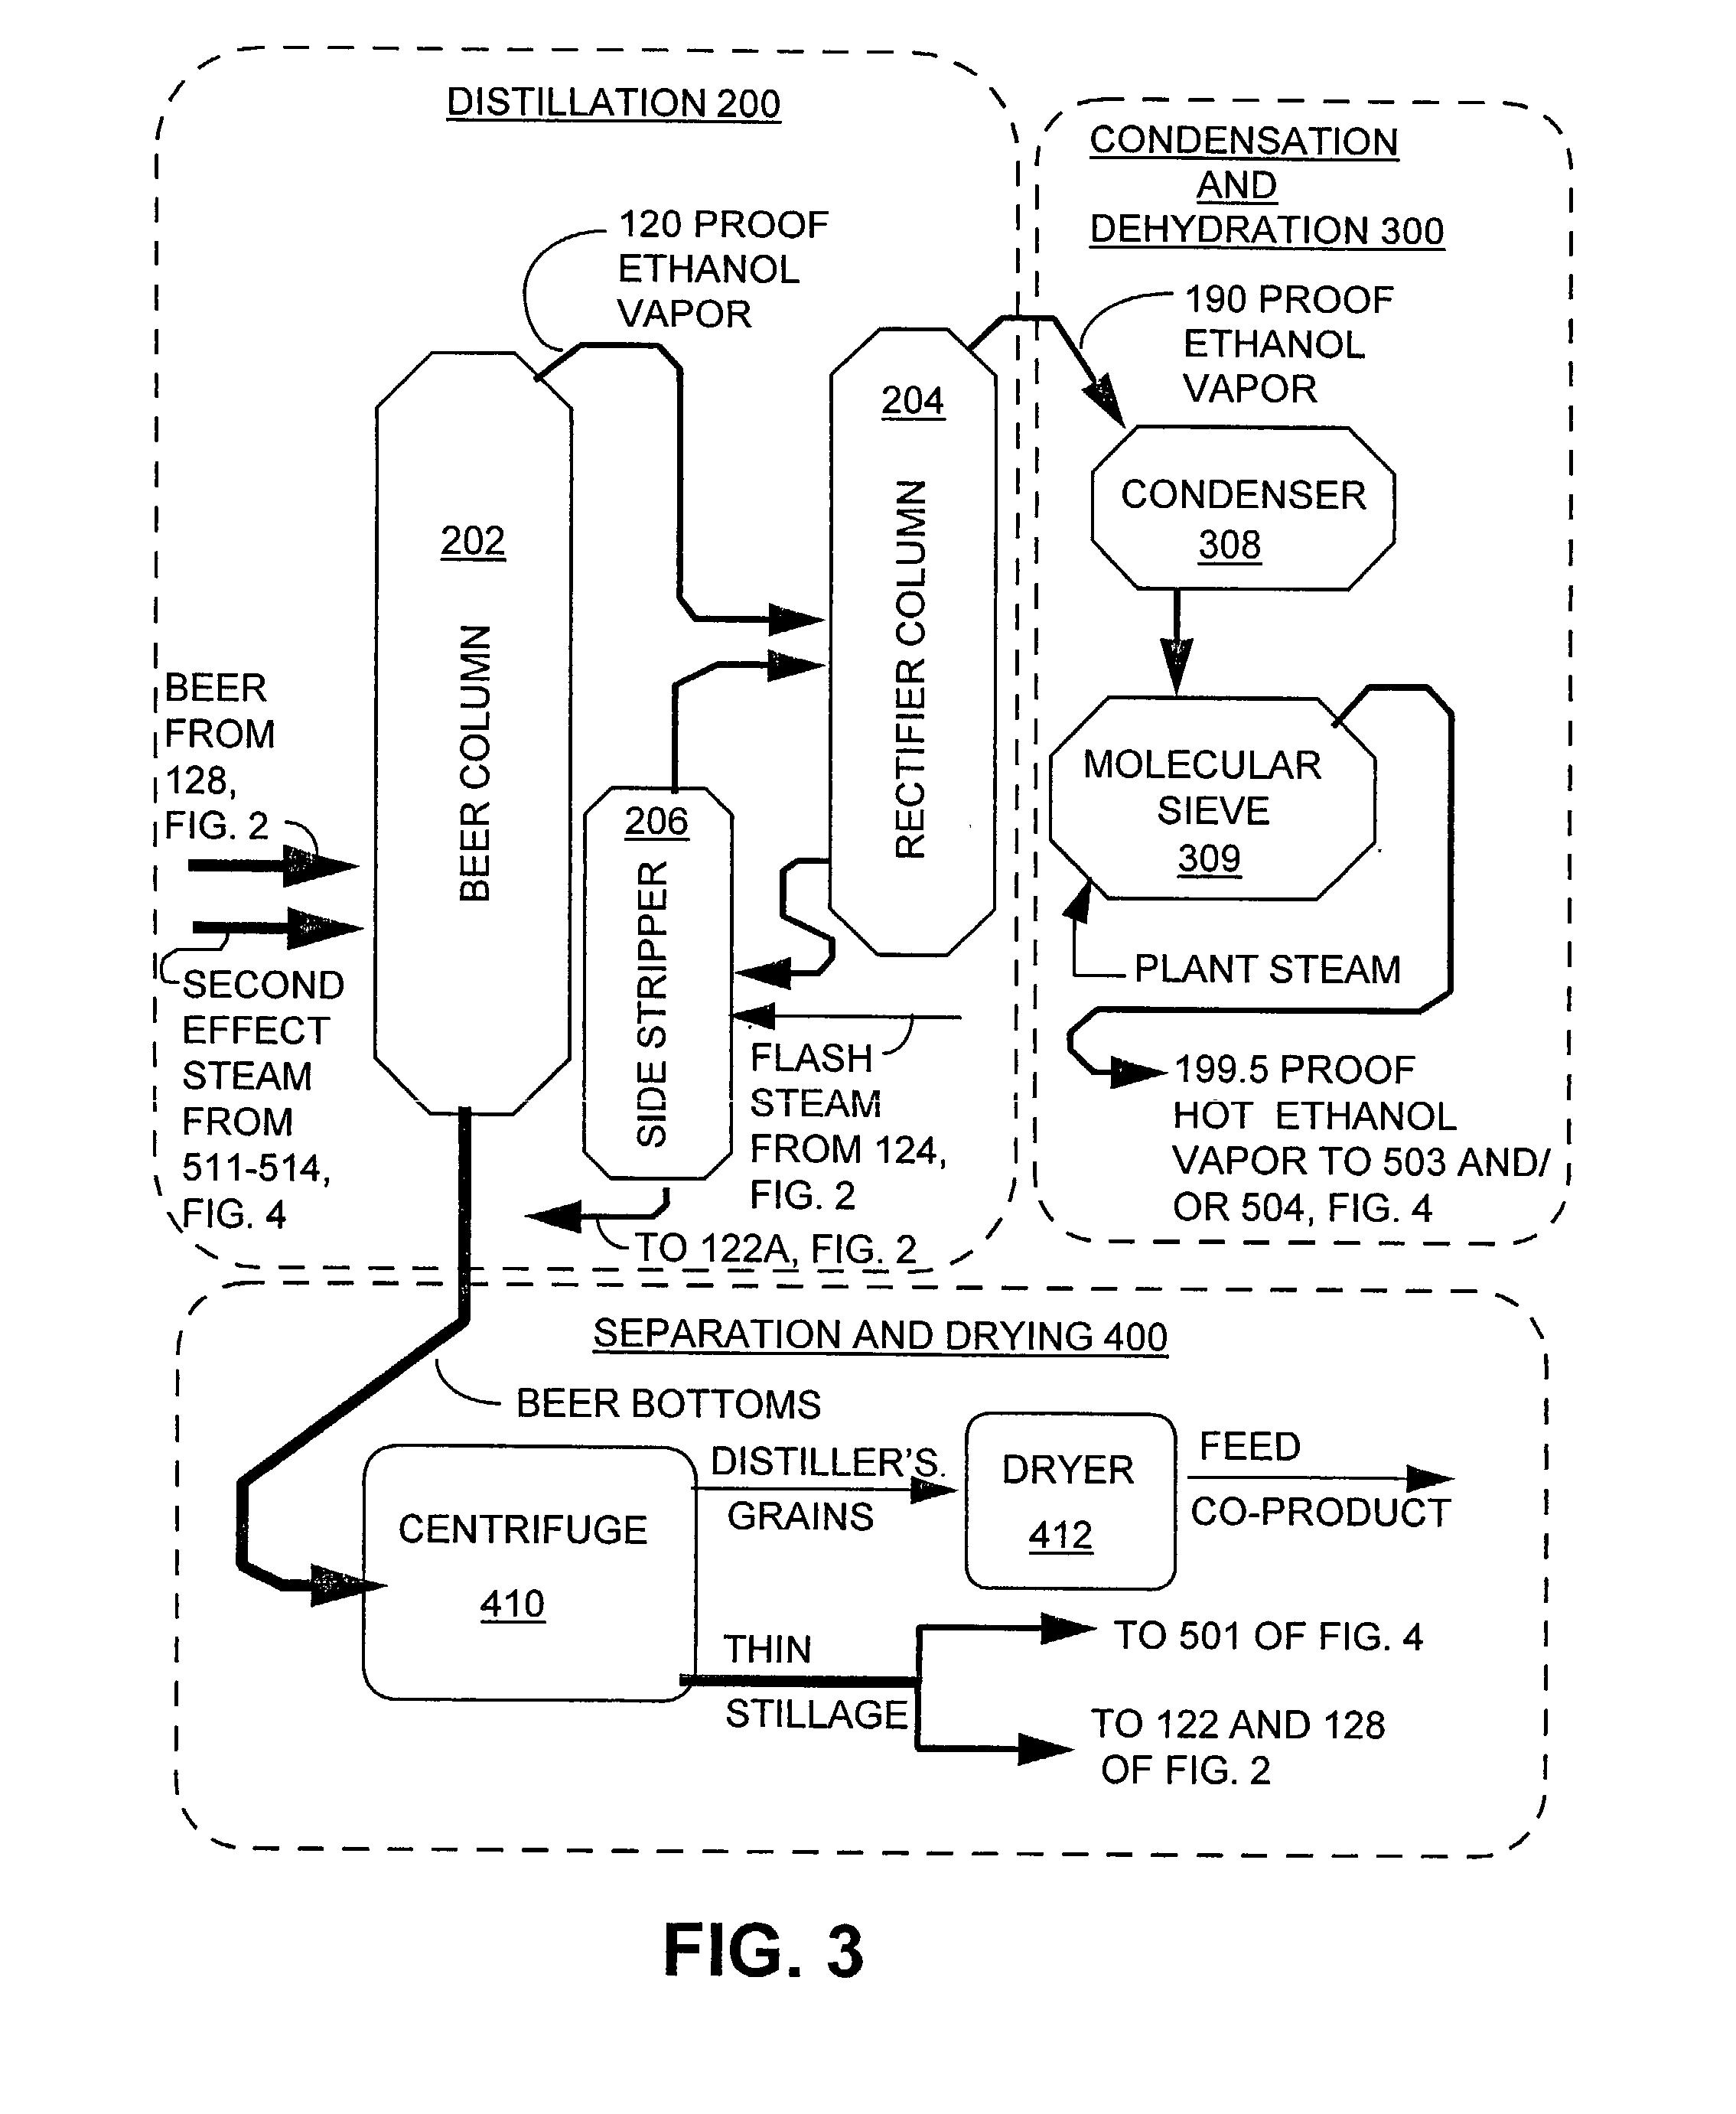 Patent Us7297236 - Ethanol Distillation Process